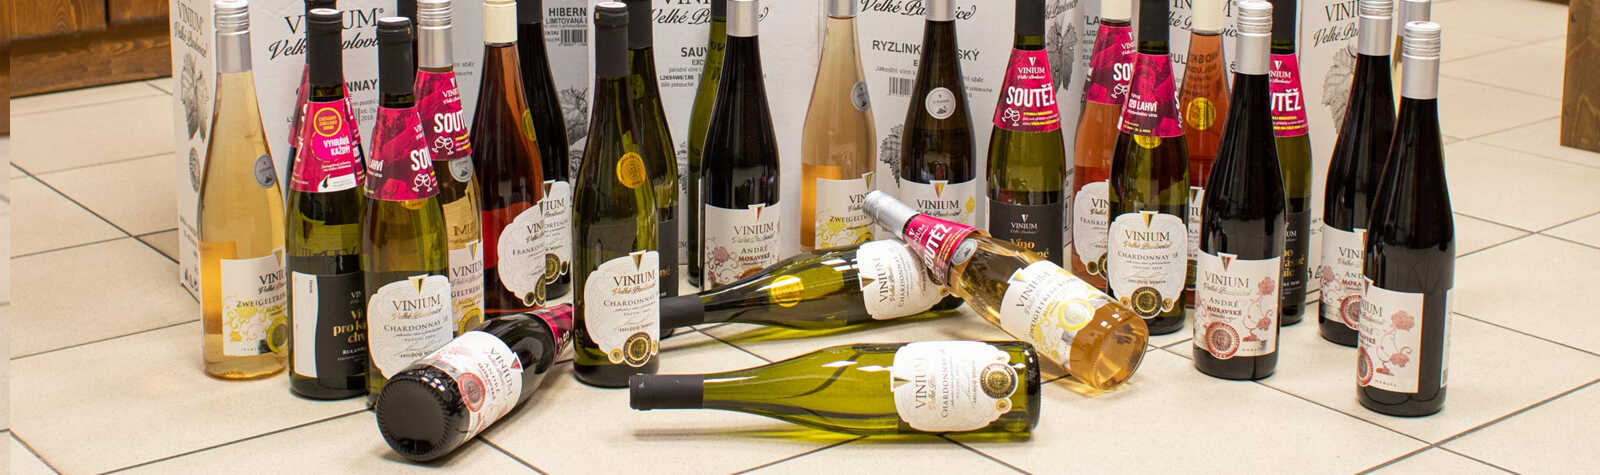 Vyhrajte 120 lahví vína